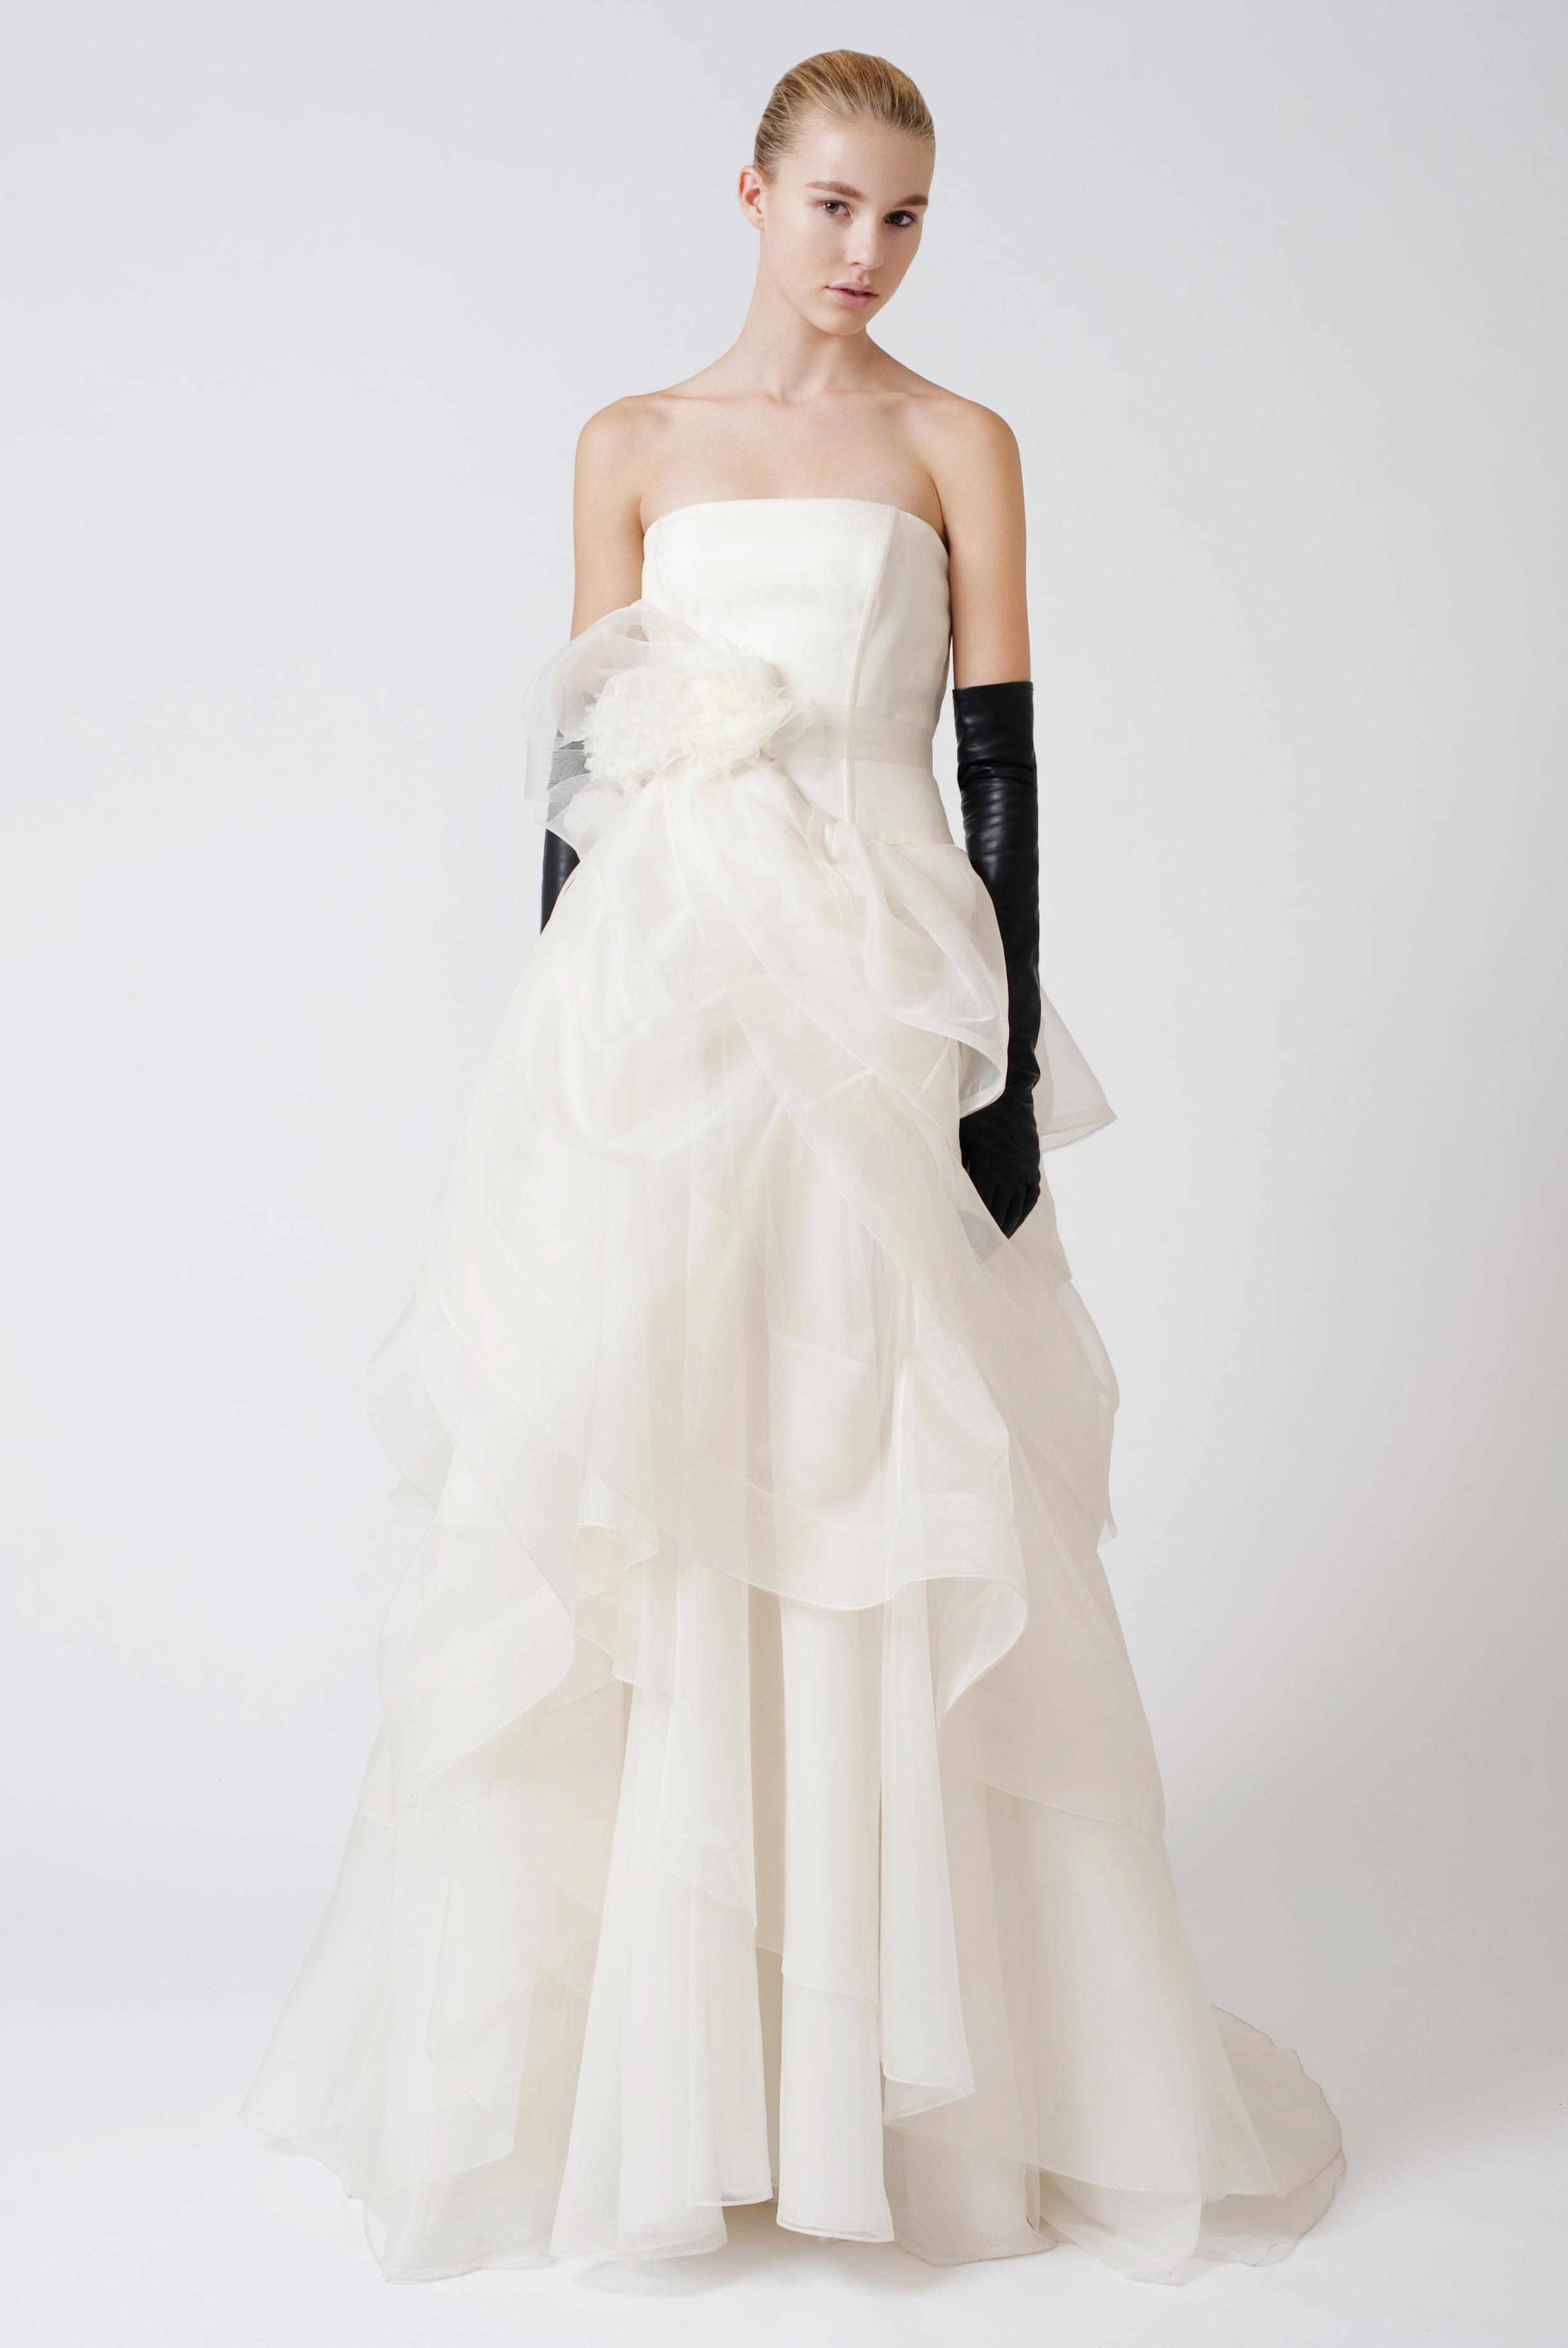 nordstrom wedding dresses san francisco nordstrom wedding dresses Wedding Dresses Ball Gown Fashion Flower Vera Strapless